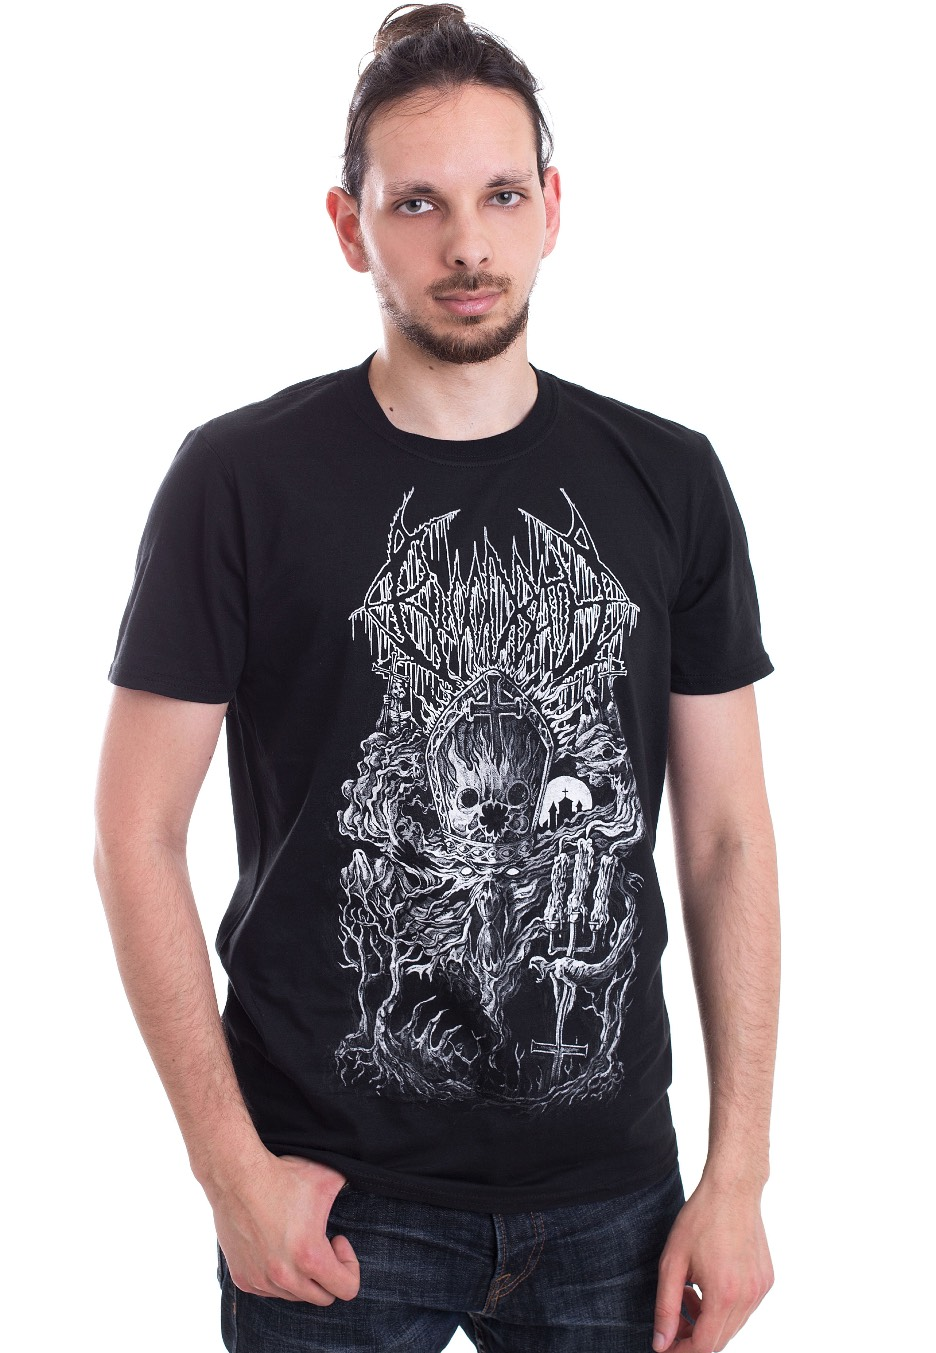 Bloodbath /'Morbid/' T-Shirt NEW /& OFFICIAL!